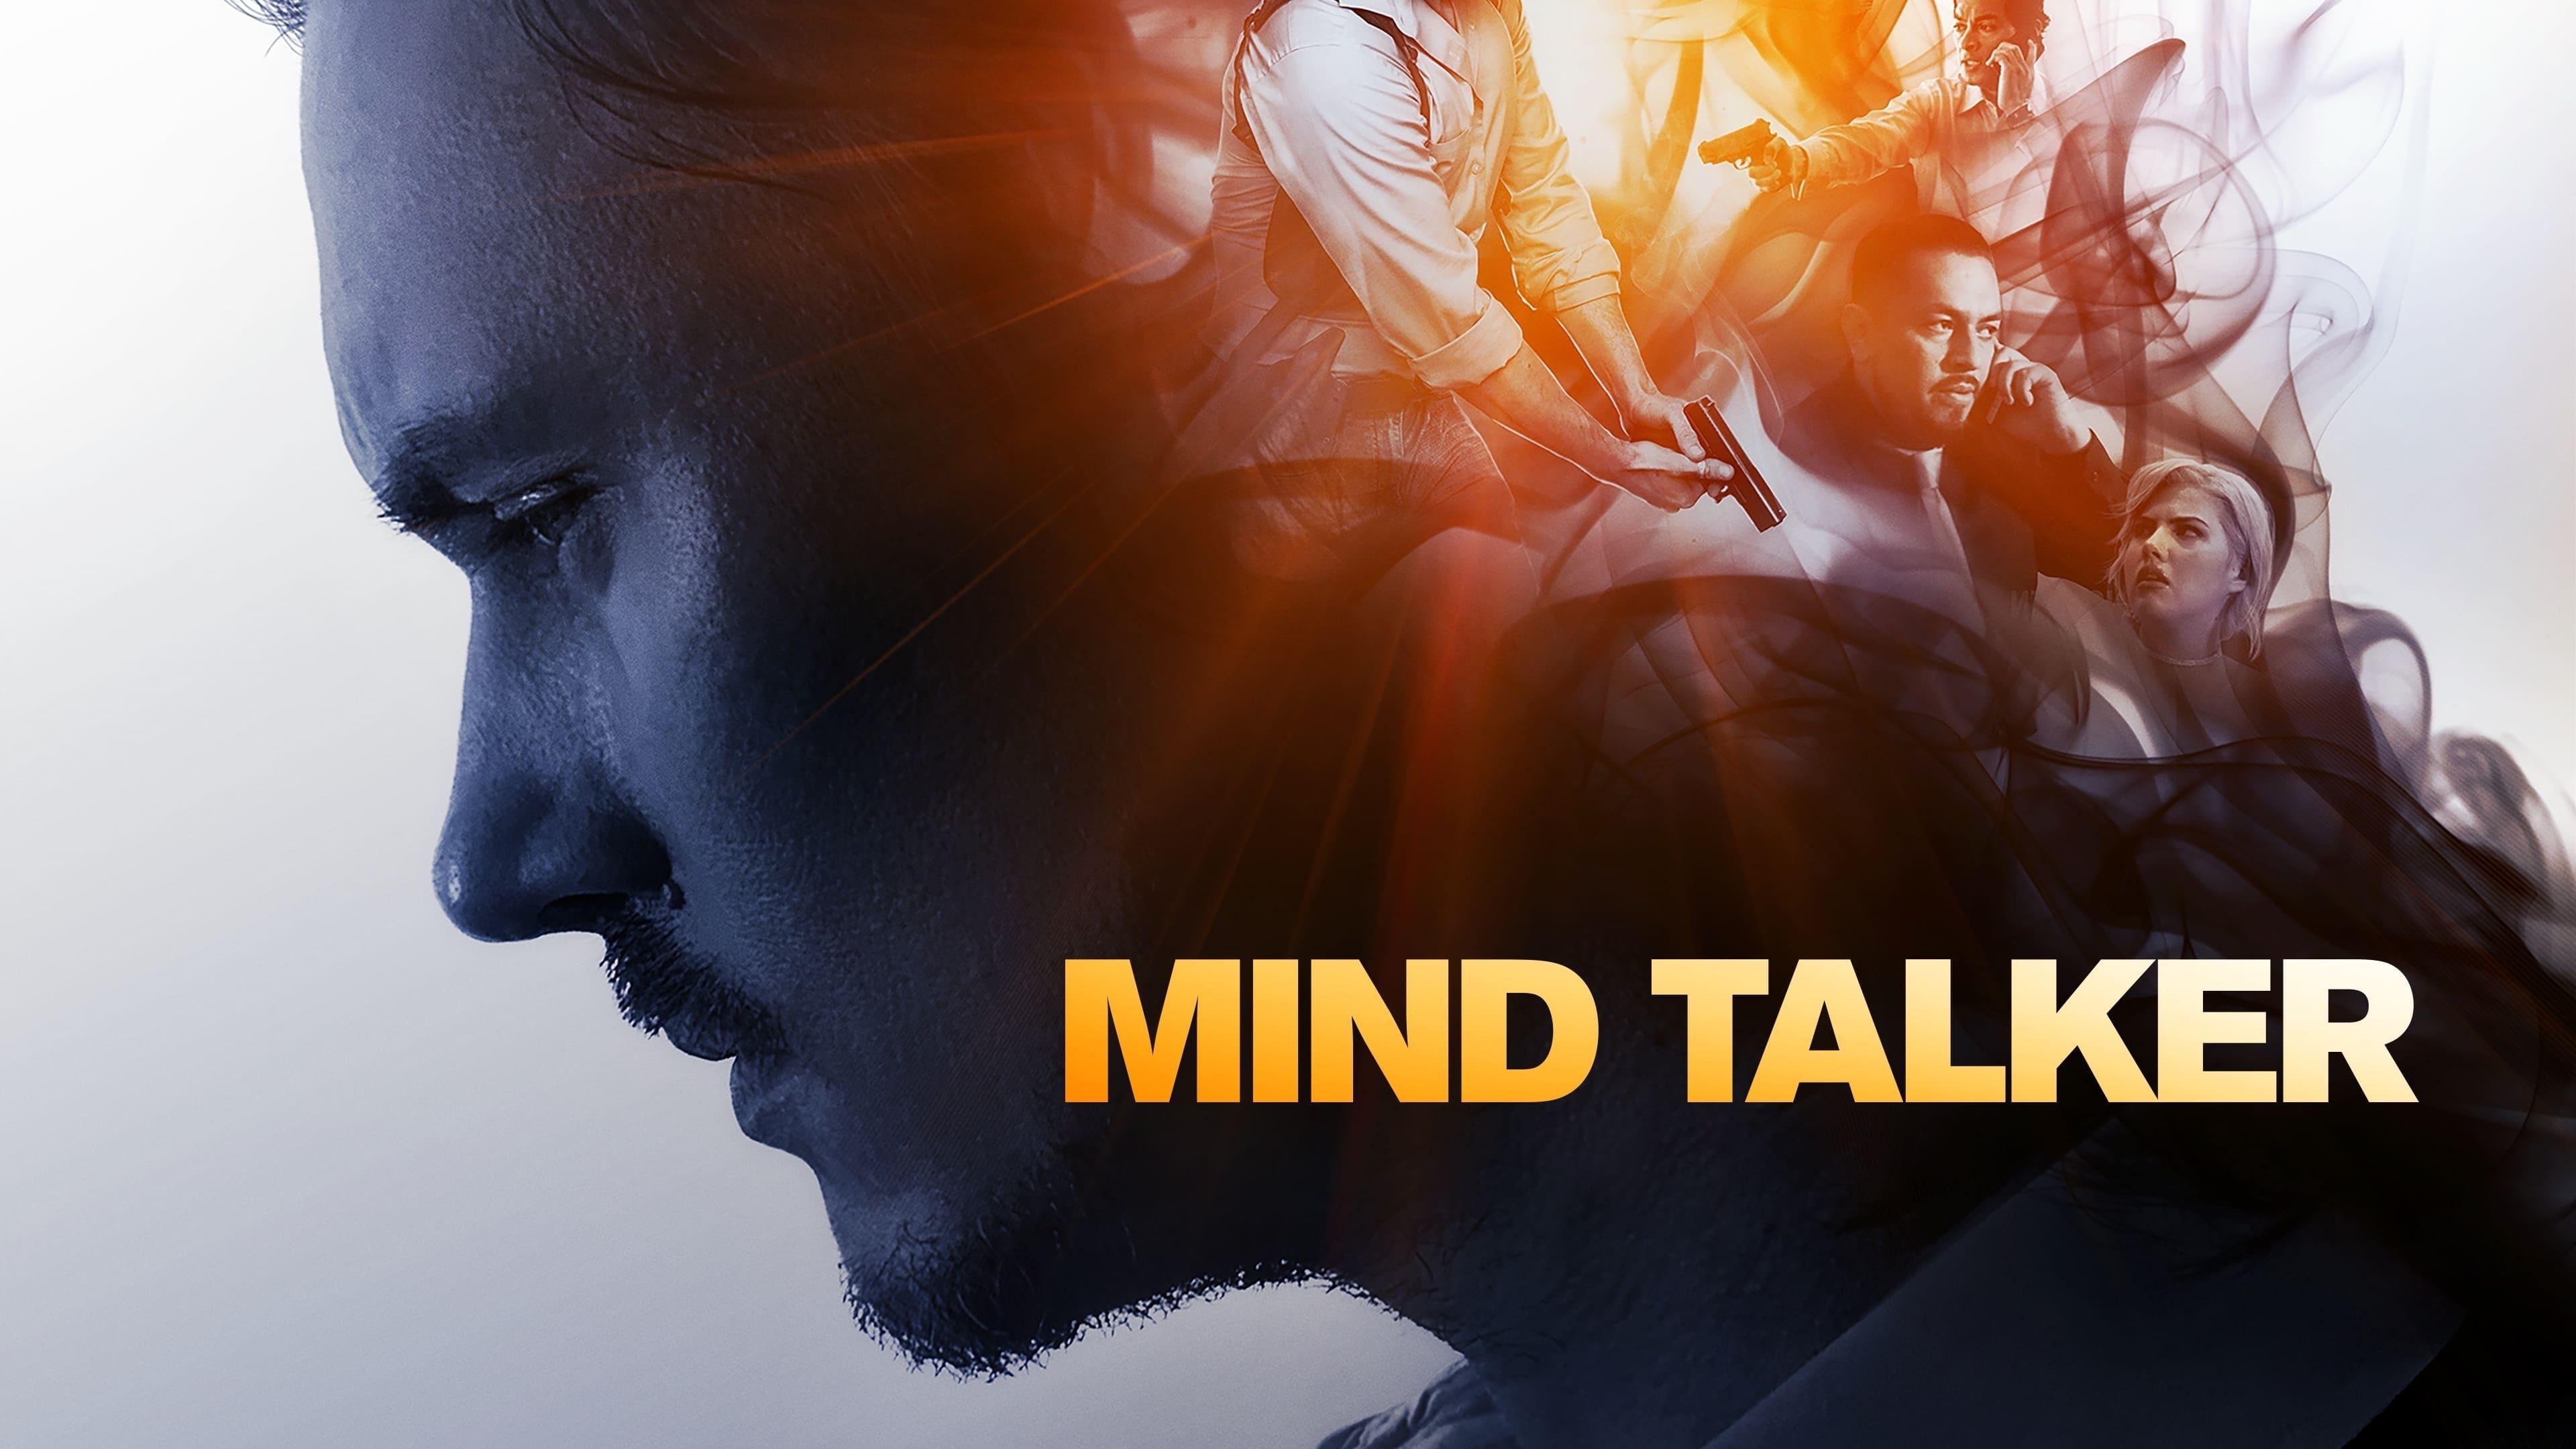 Película Mind Talker en GNULA